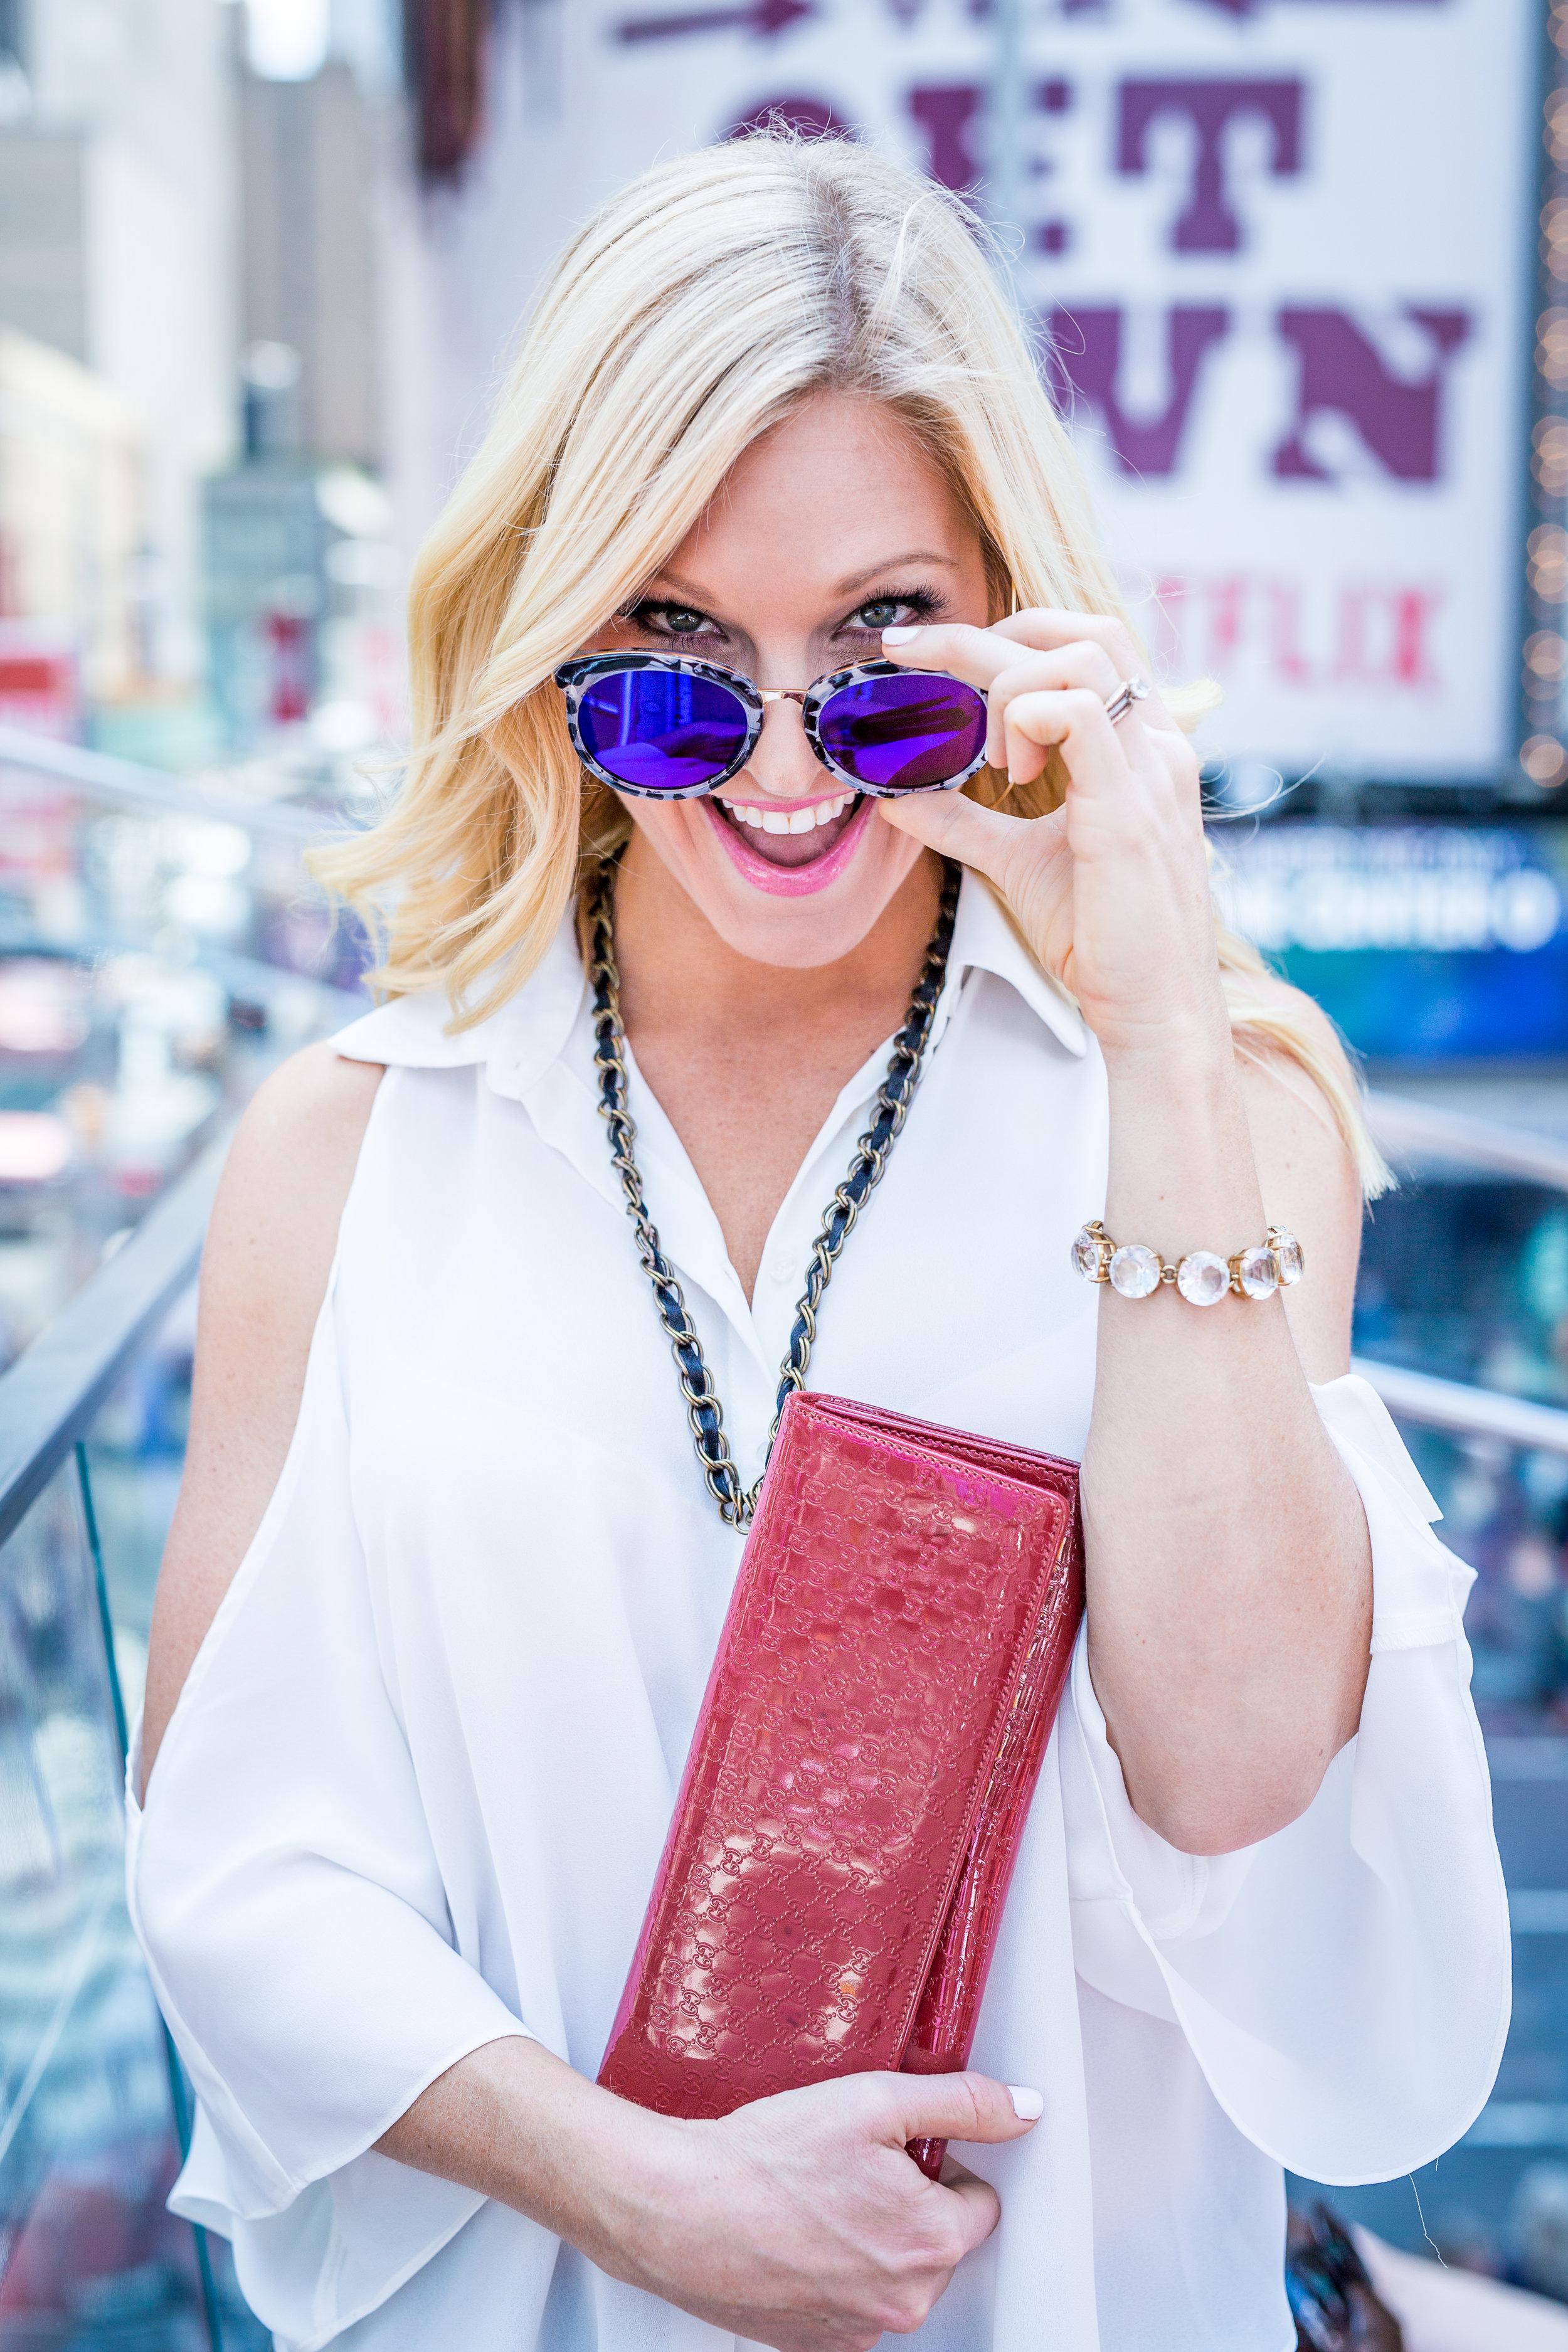 Anna Kooiman AnnaKooiman.com fashion fitness travel lifestyle television new york city